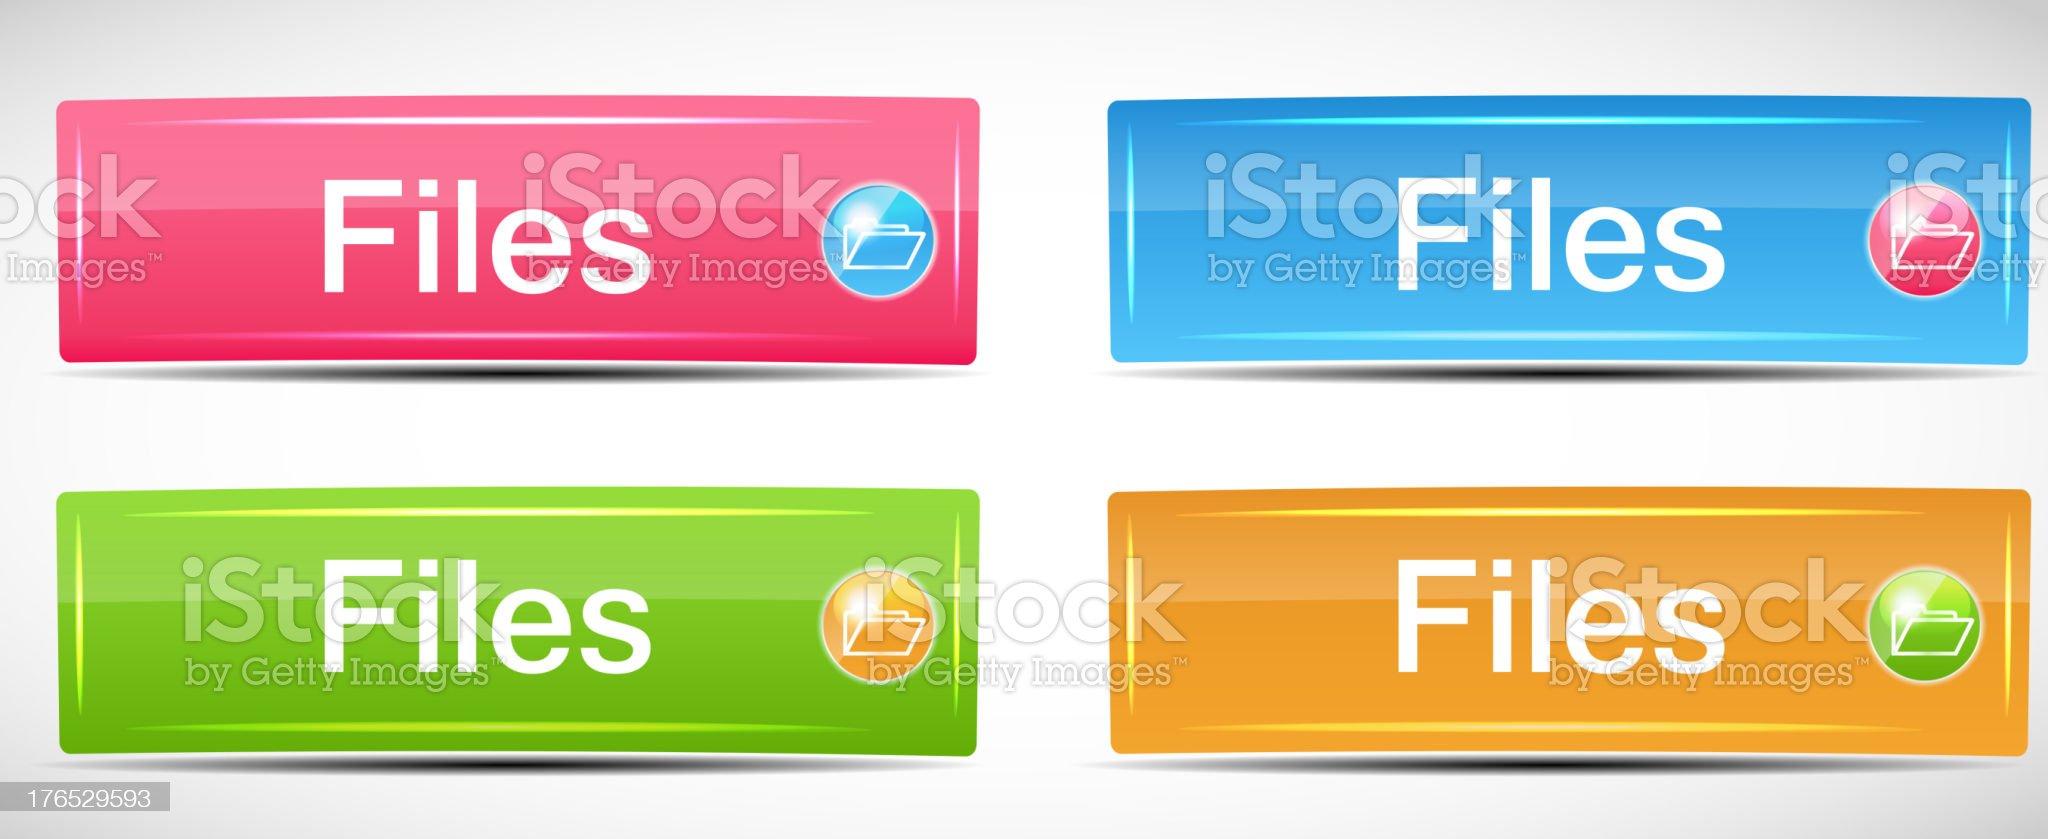 Shiny Rectangle Menu Buttons vector illustration royalty-free stock vector art